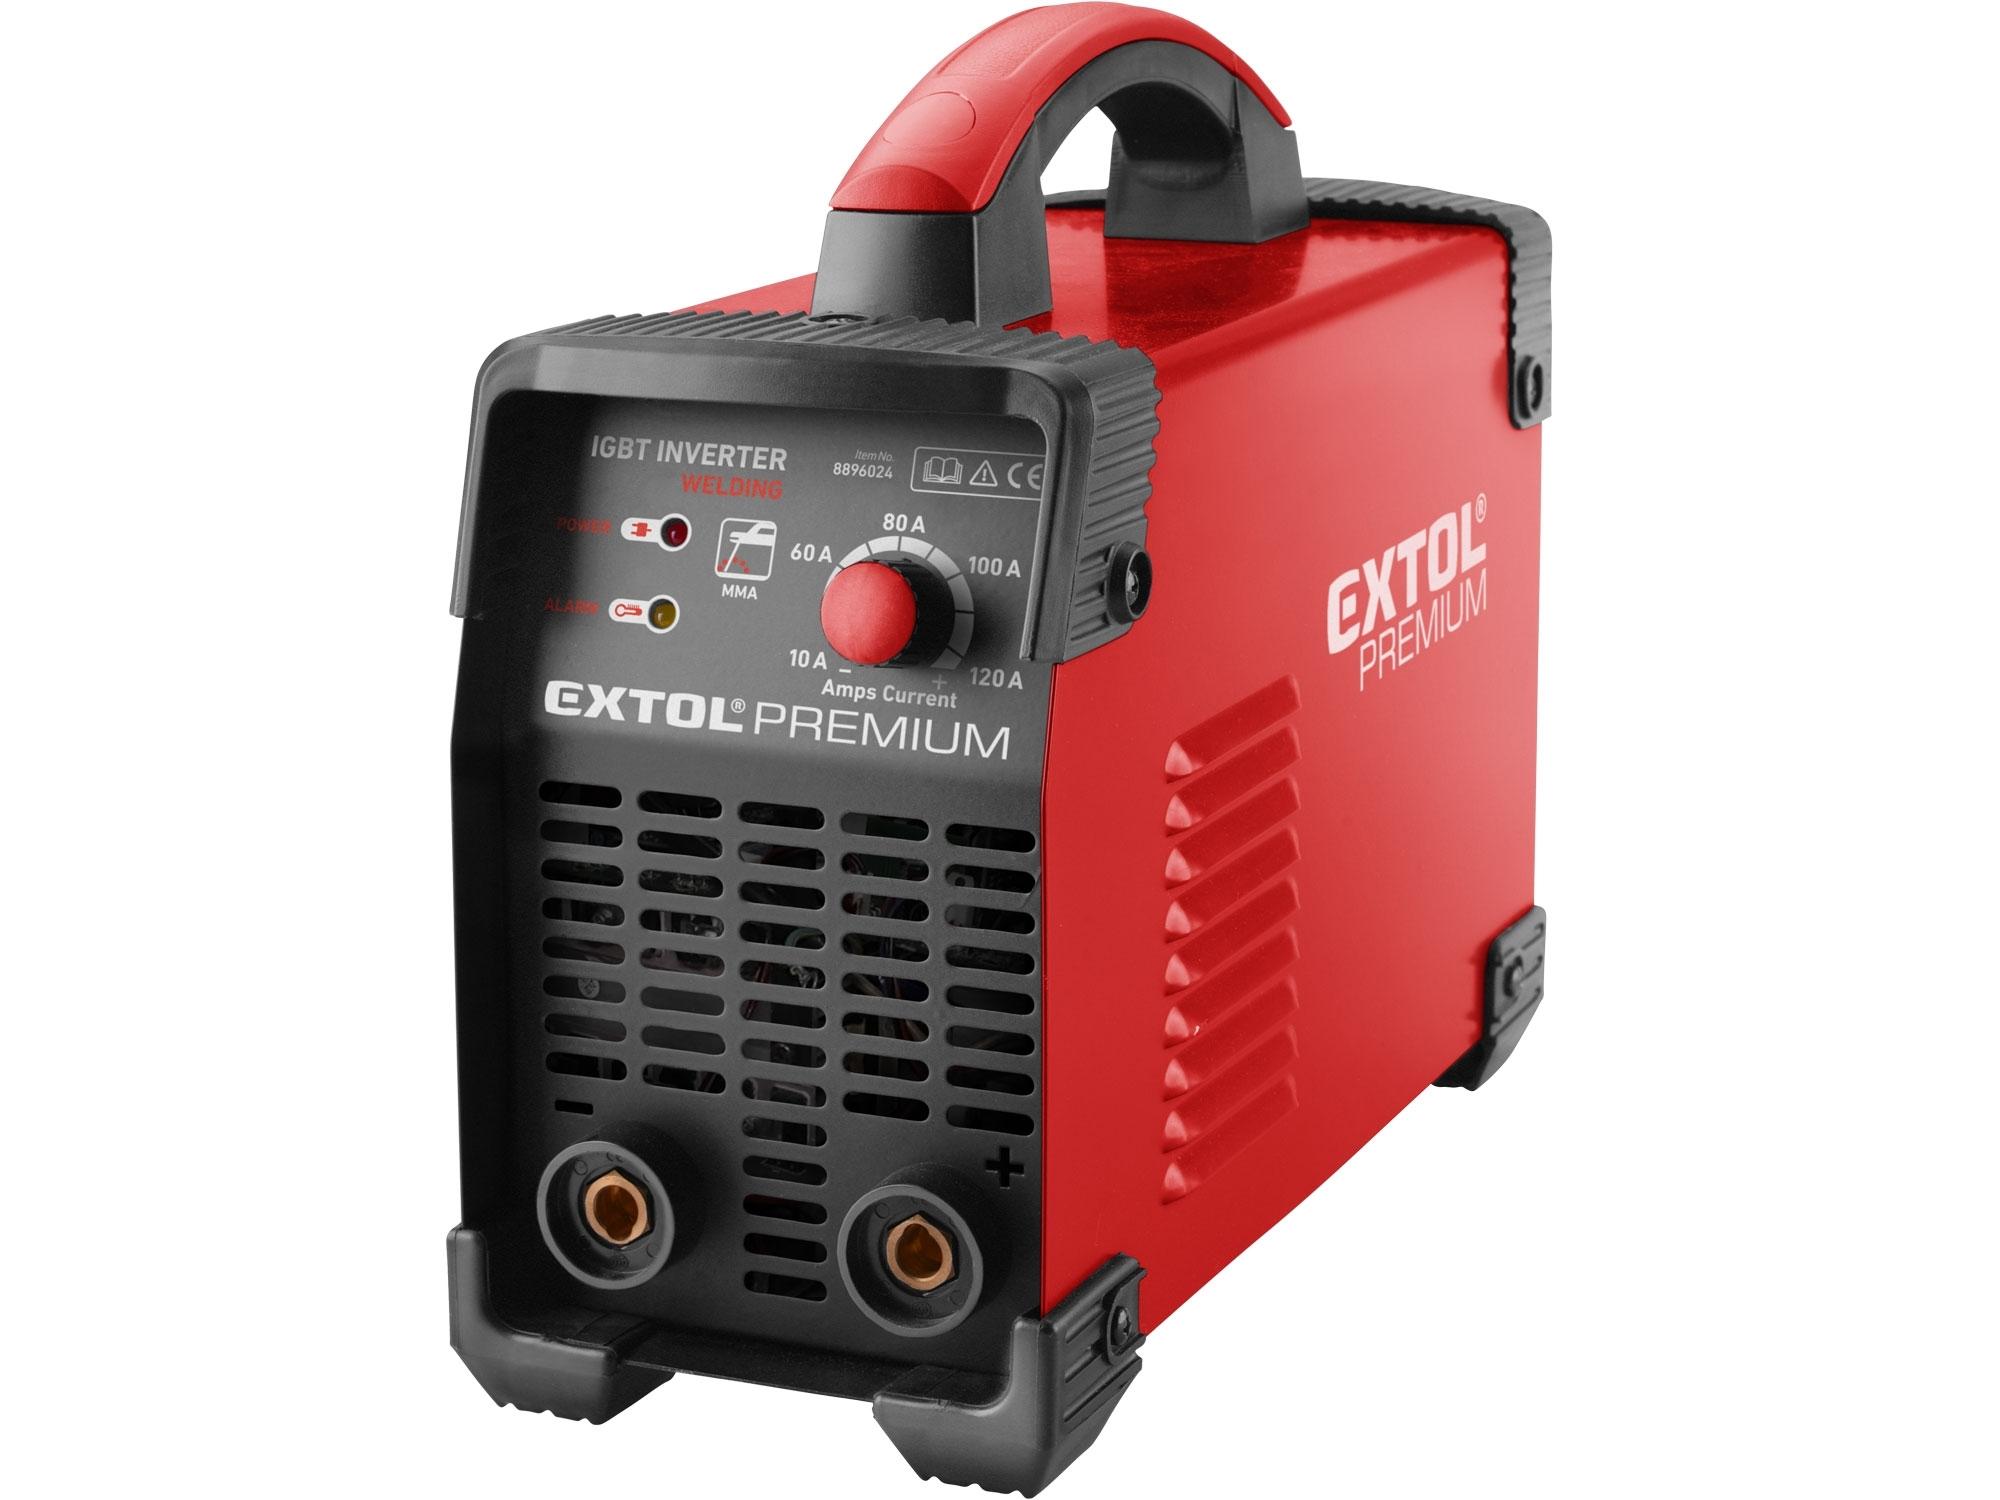 Invertor svařovací 120A EXTOL PREMIUM 8896024